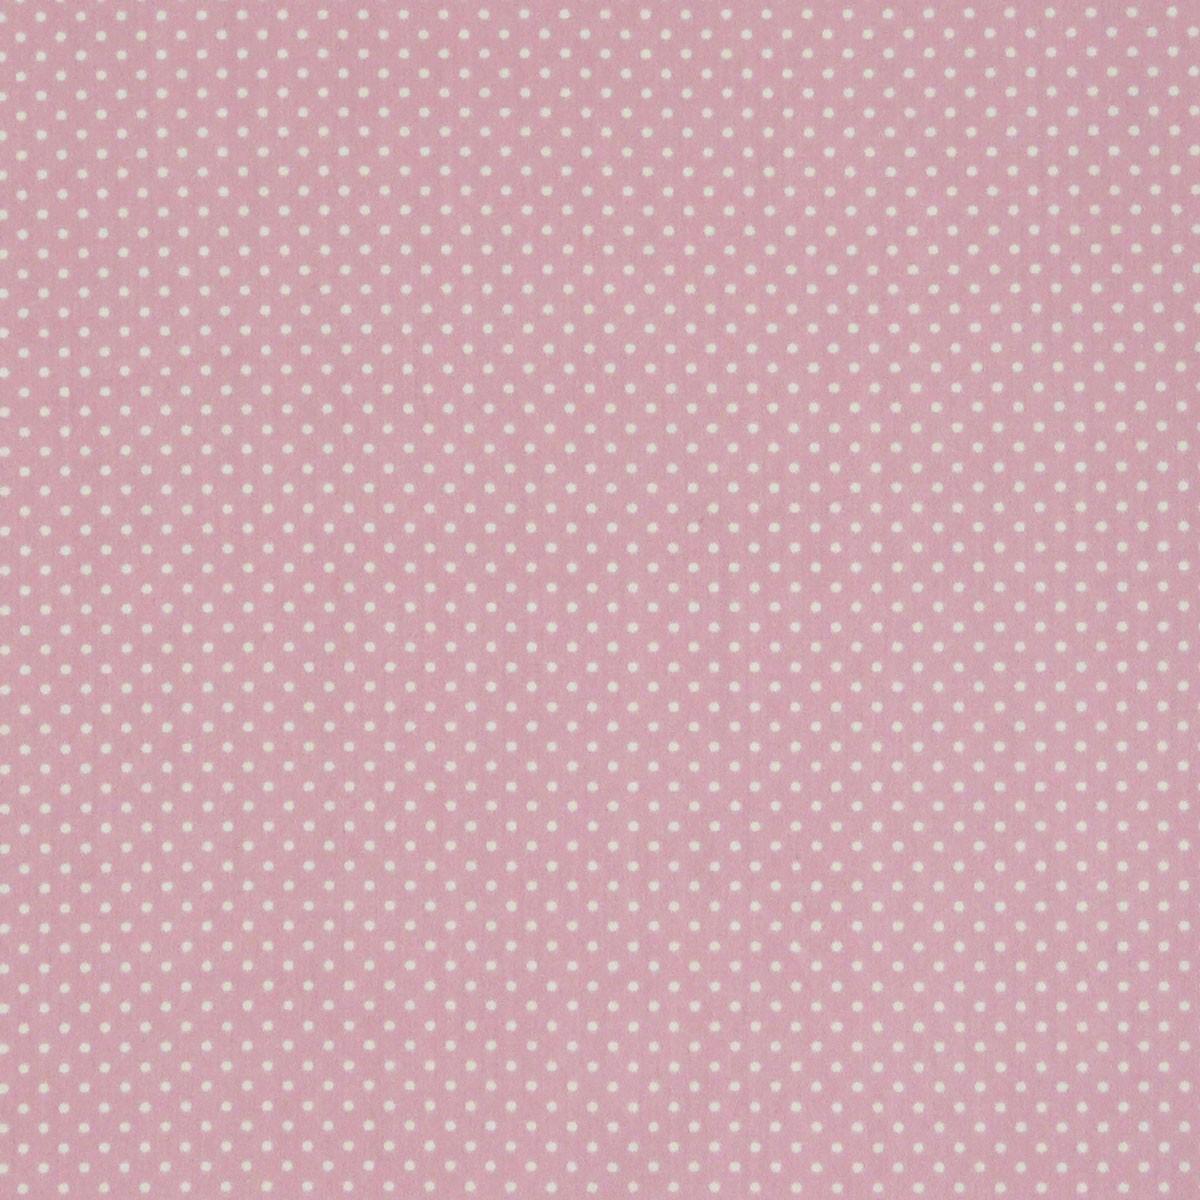 gardinenstoff stoff dekostoff meterware rosa creme punkte stoffe stoffe gemustert stoff punkte. Black Bedroom Furniture Sets. Home Design Ideas